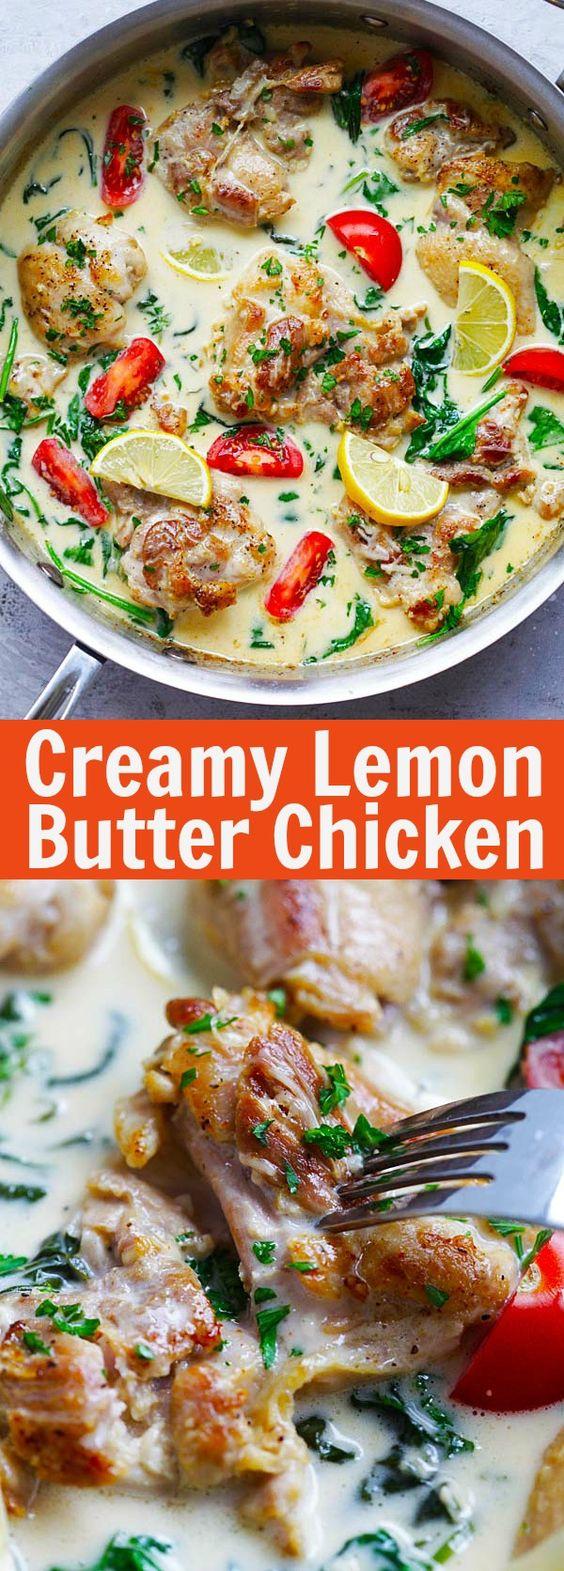 Lemon Butter Chicken Recipe